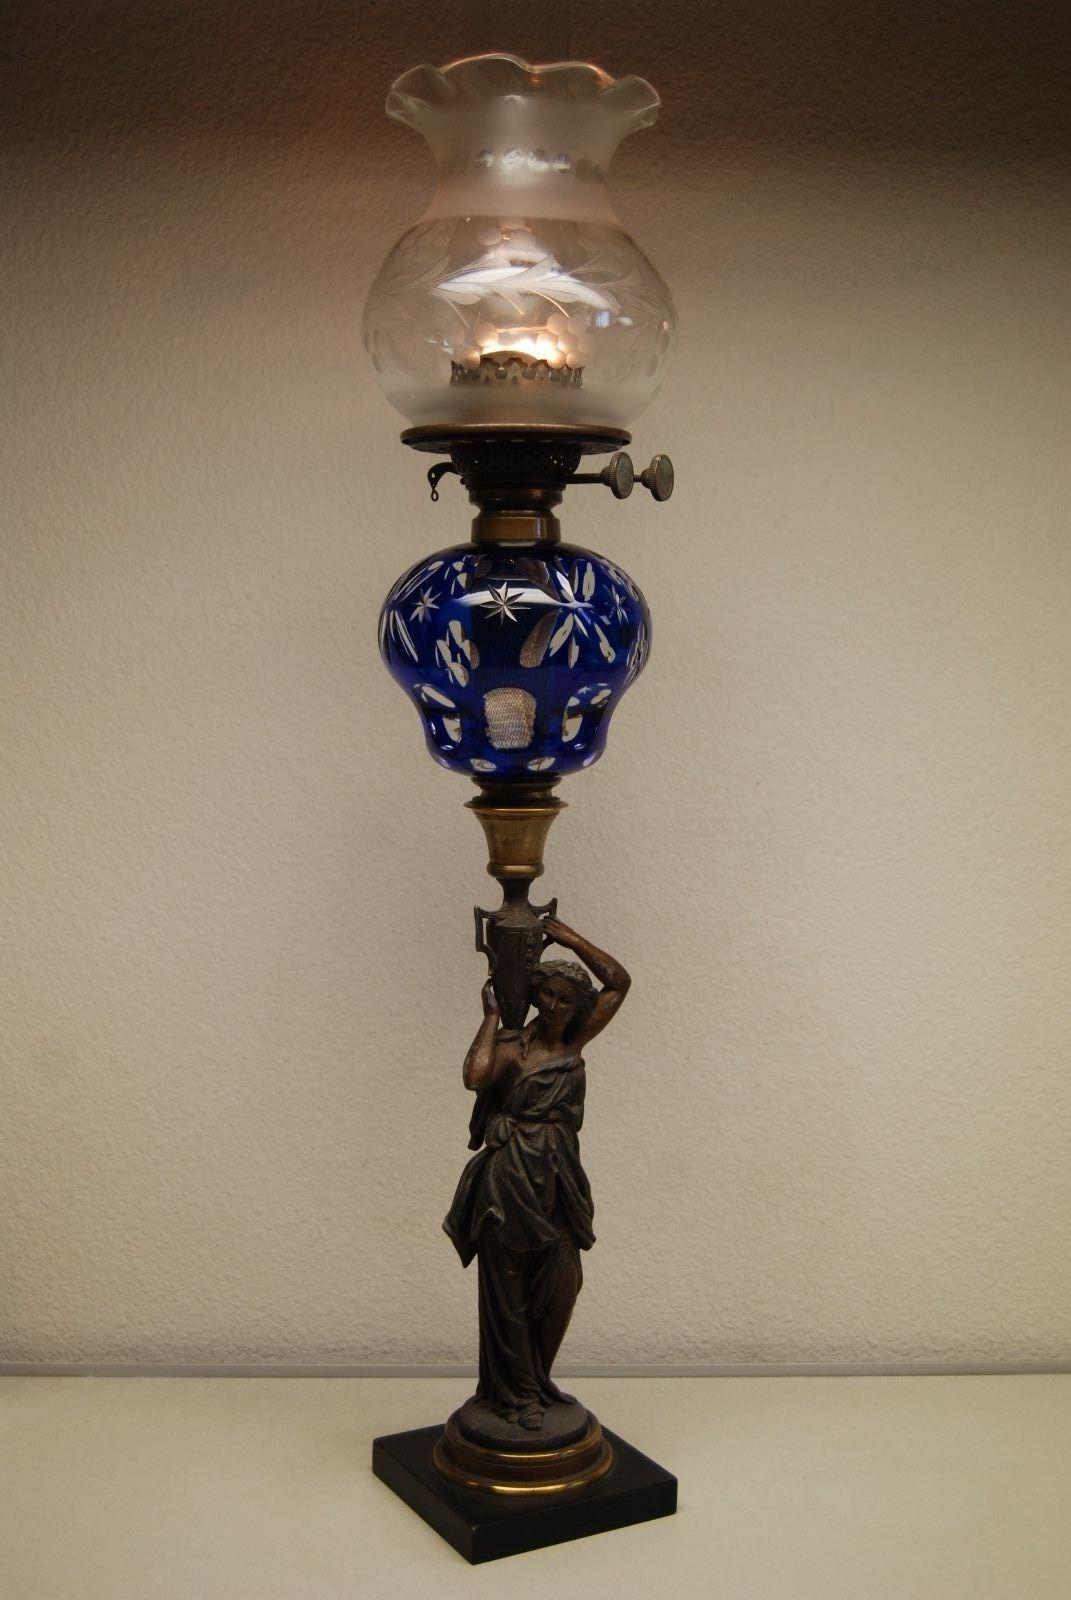 Details About Antique Boston Sandwich Cobalt Glass Kerosene Oil Banquet Gwtw Victorian Lamp Vintazhnye Lampy Kerosinovaya Lampa Lampa